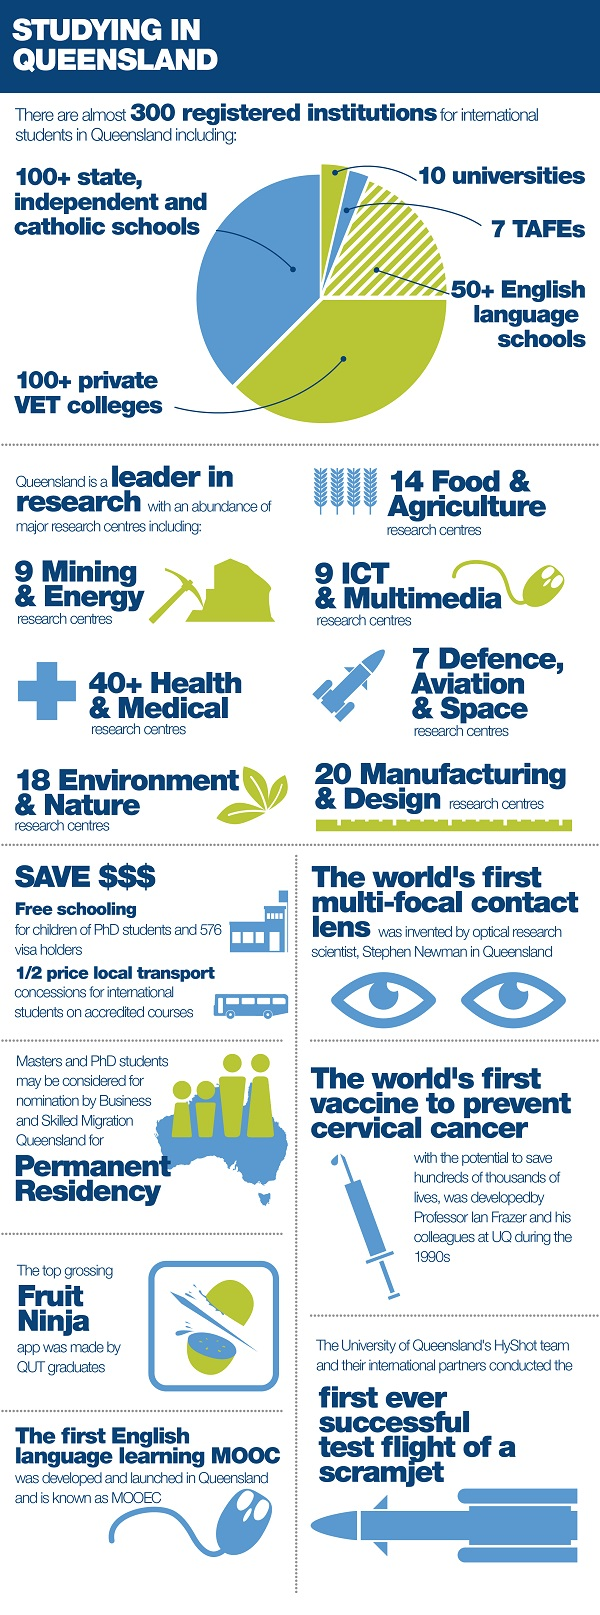 TIQ5516_infographic_C10-02.jpg